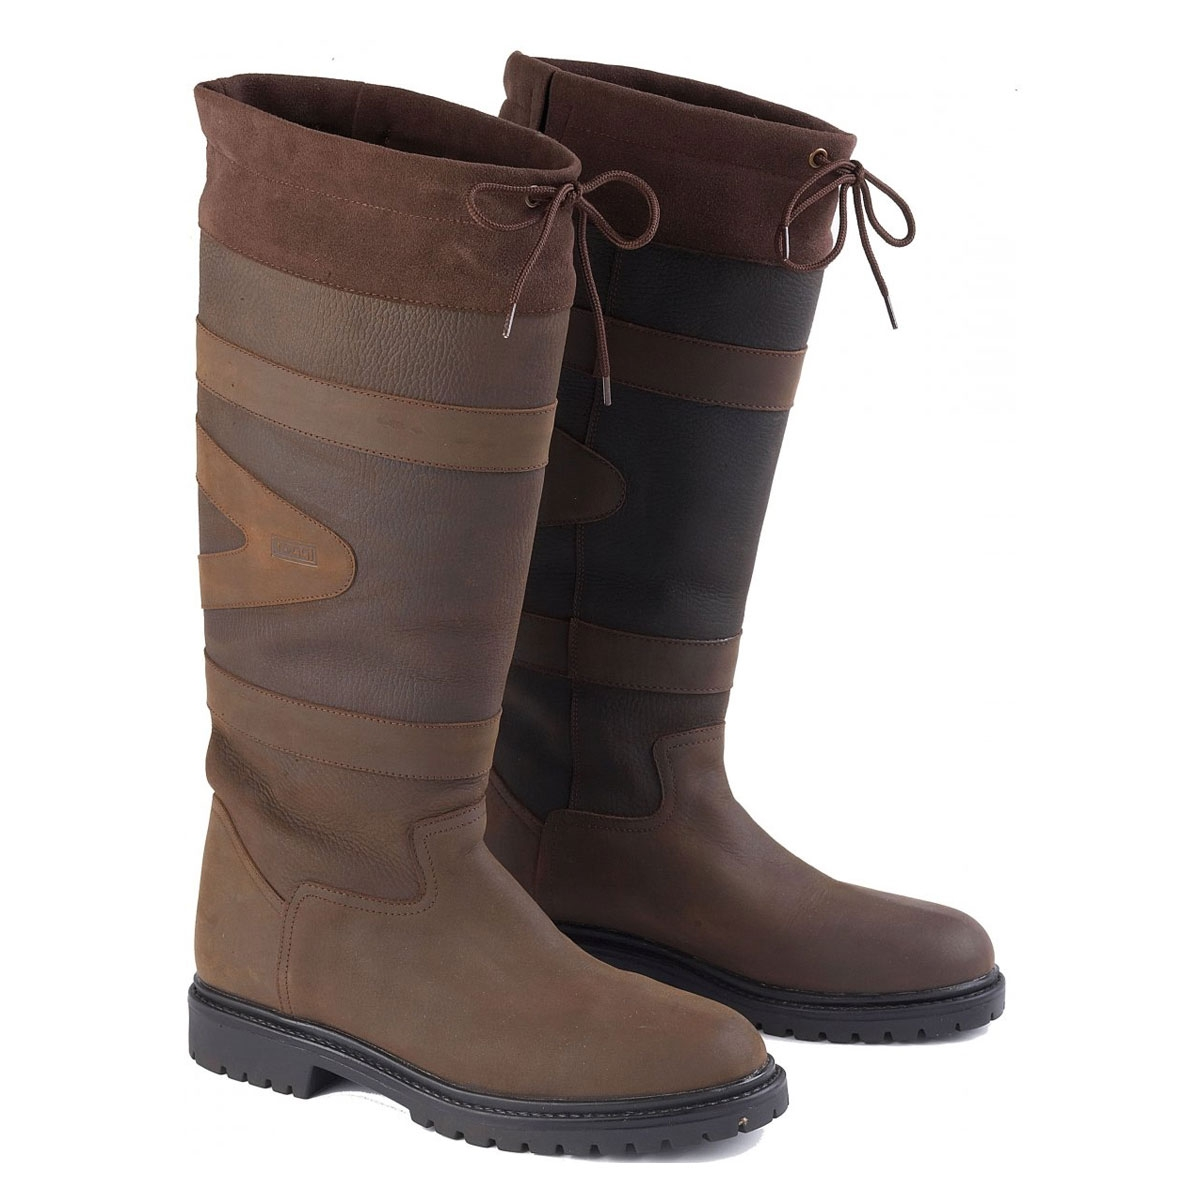 Attractive Knee High Toggi Boots